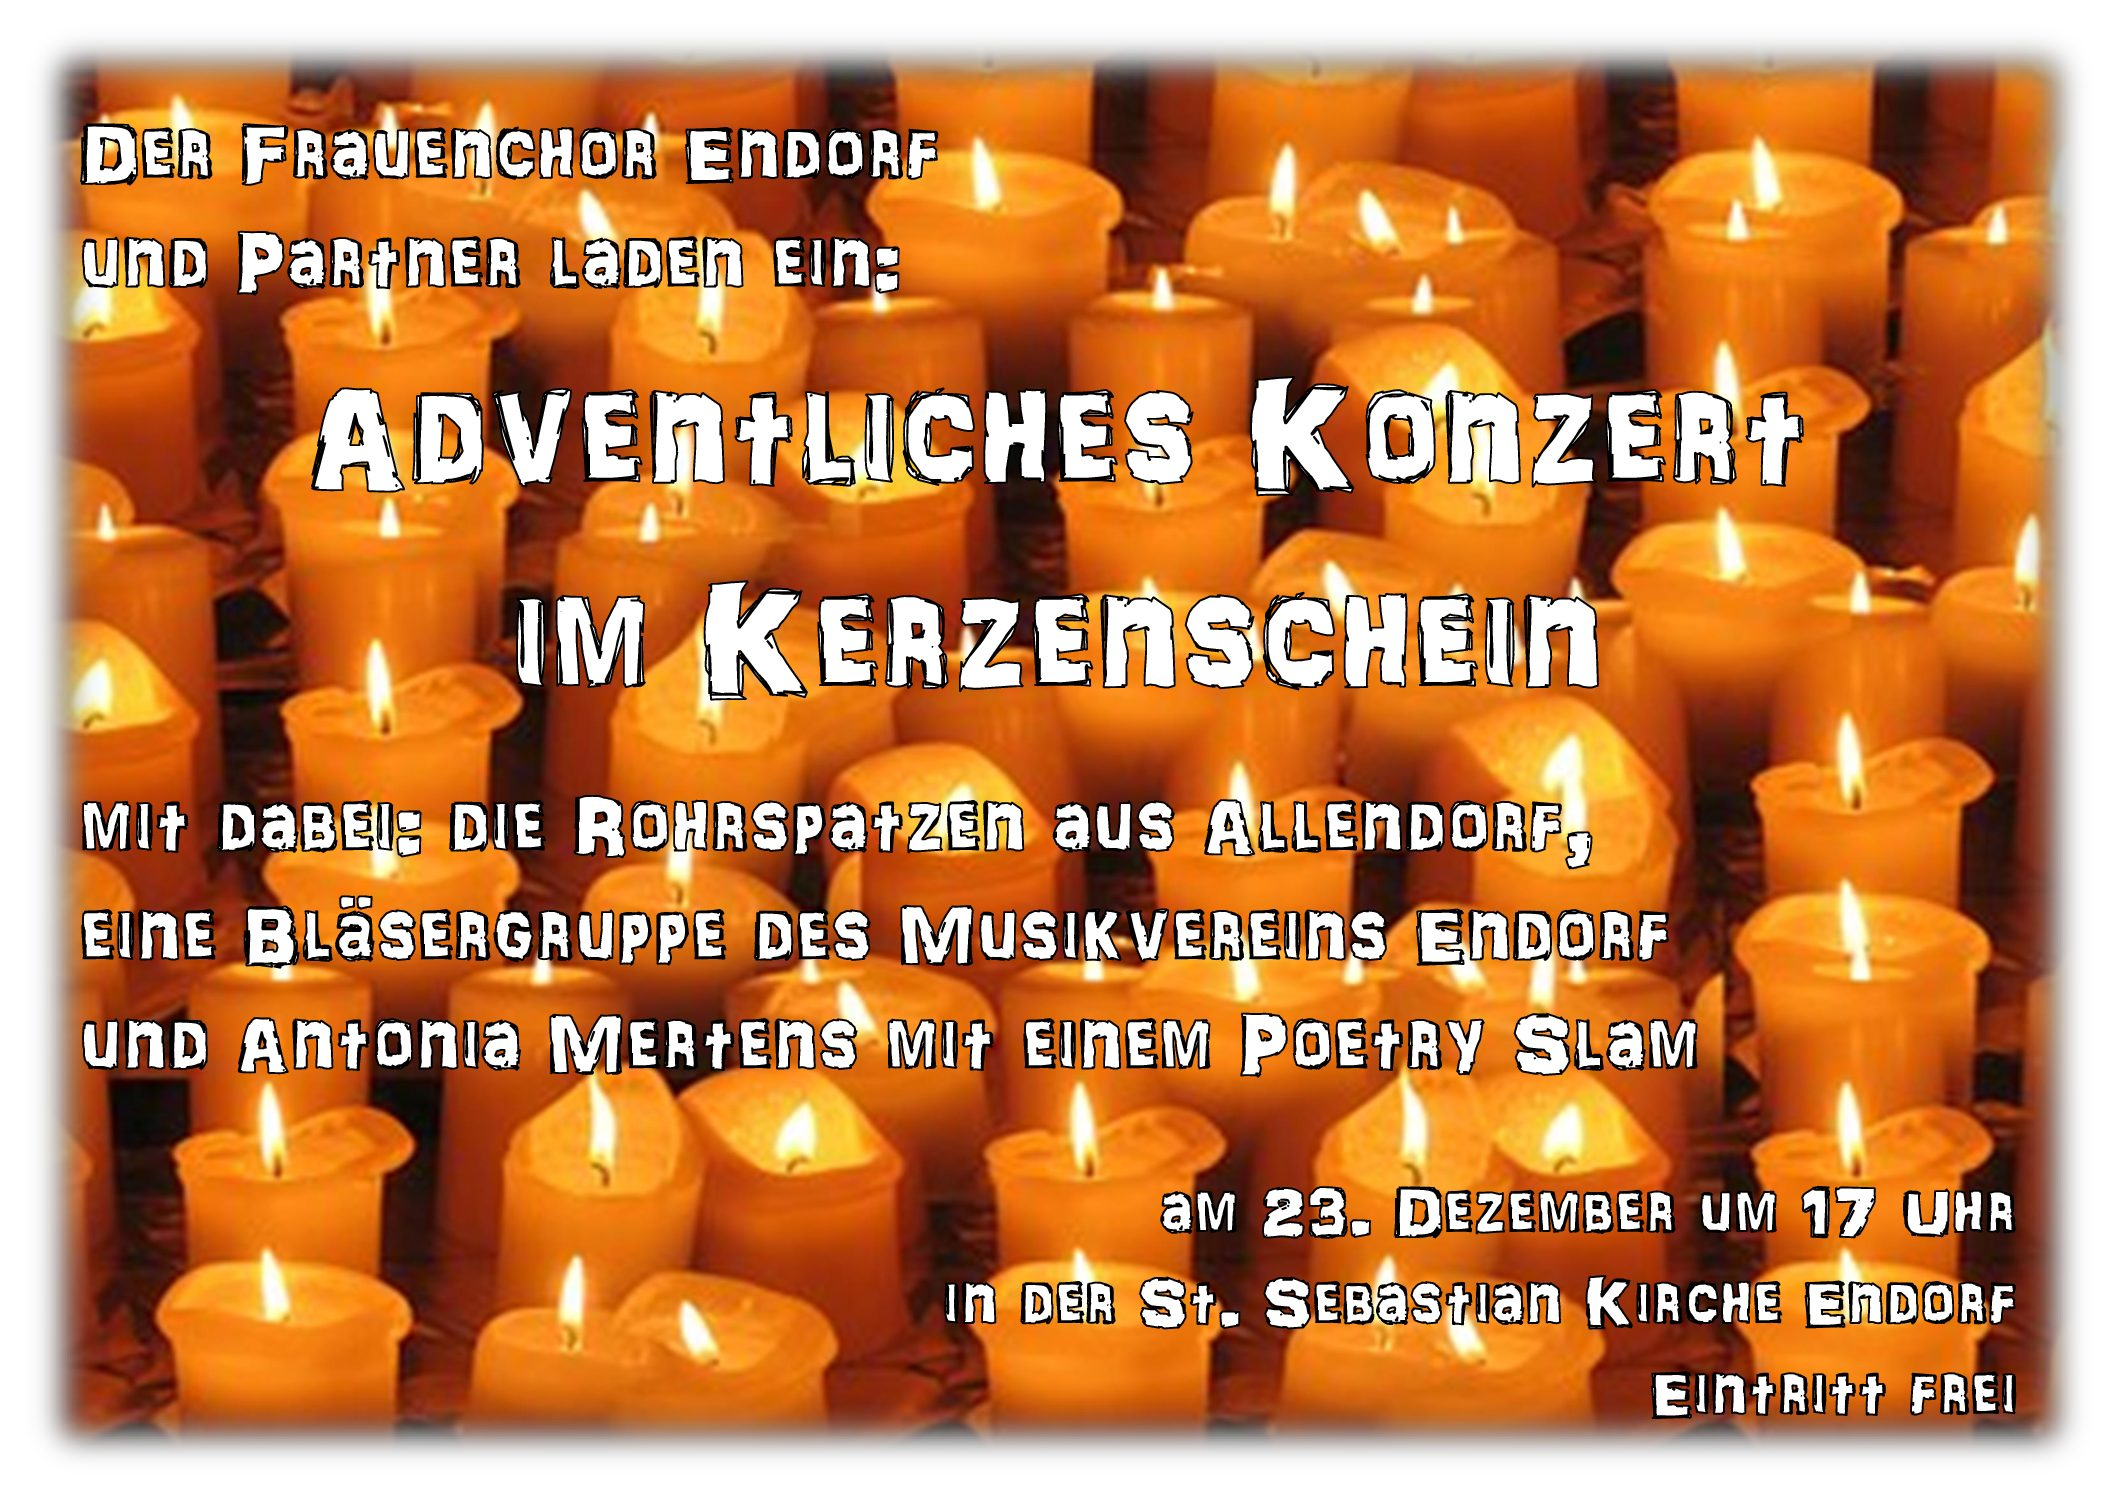 Adventliches Konzert am 23. Dezember in der St. Sebastian Kirche